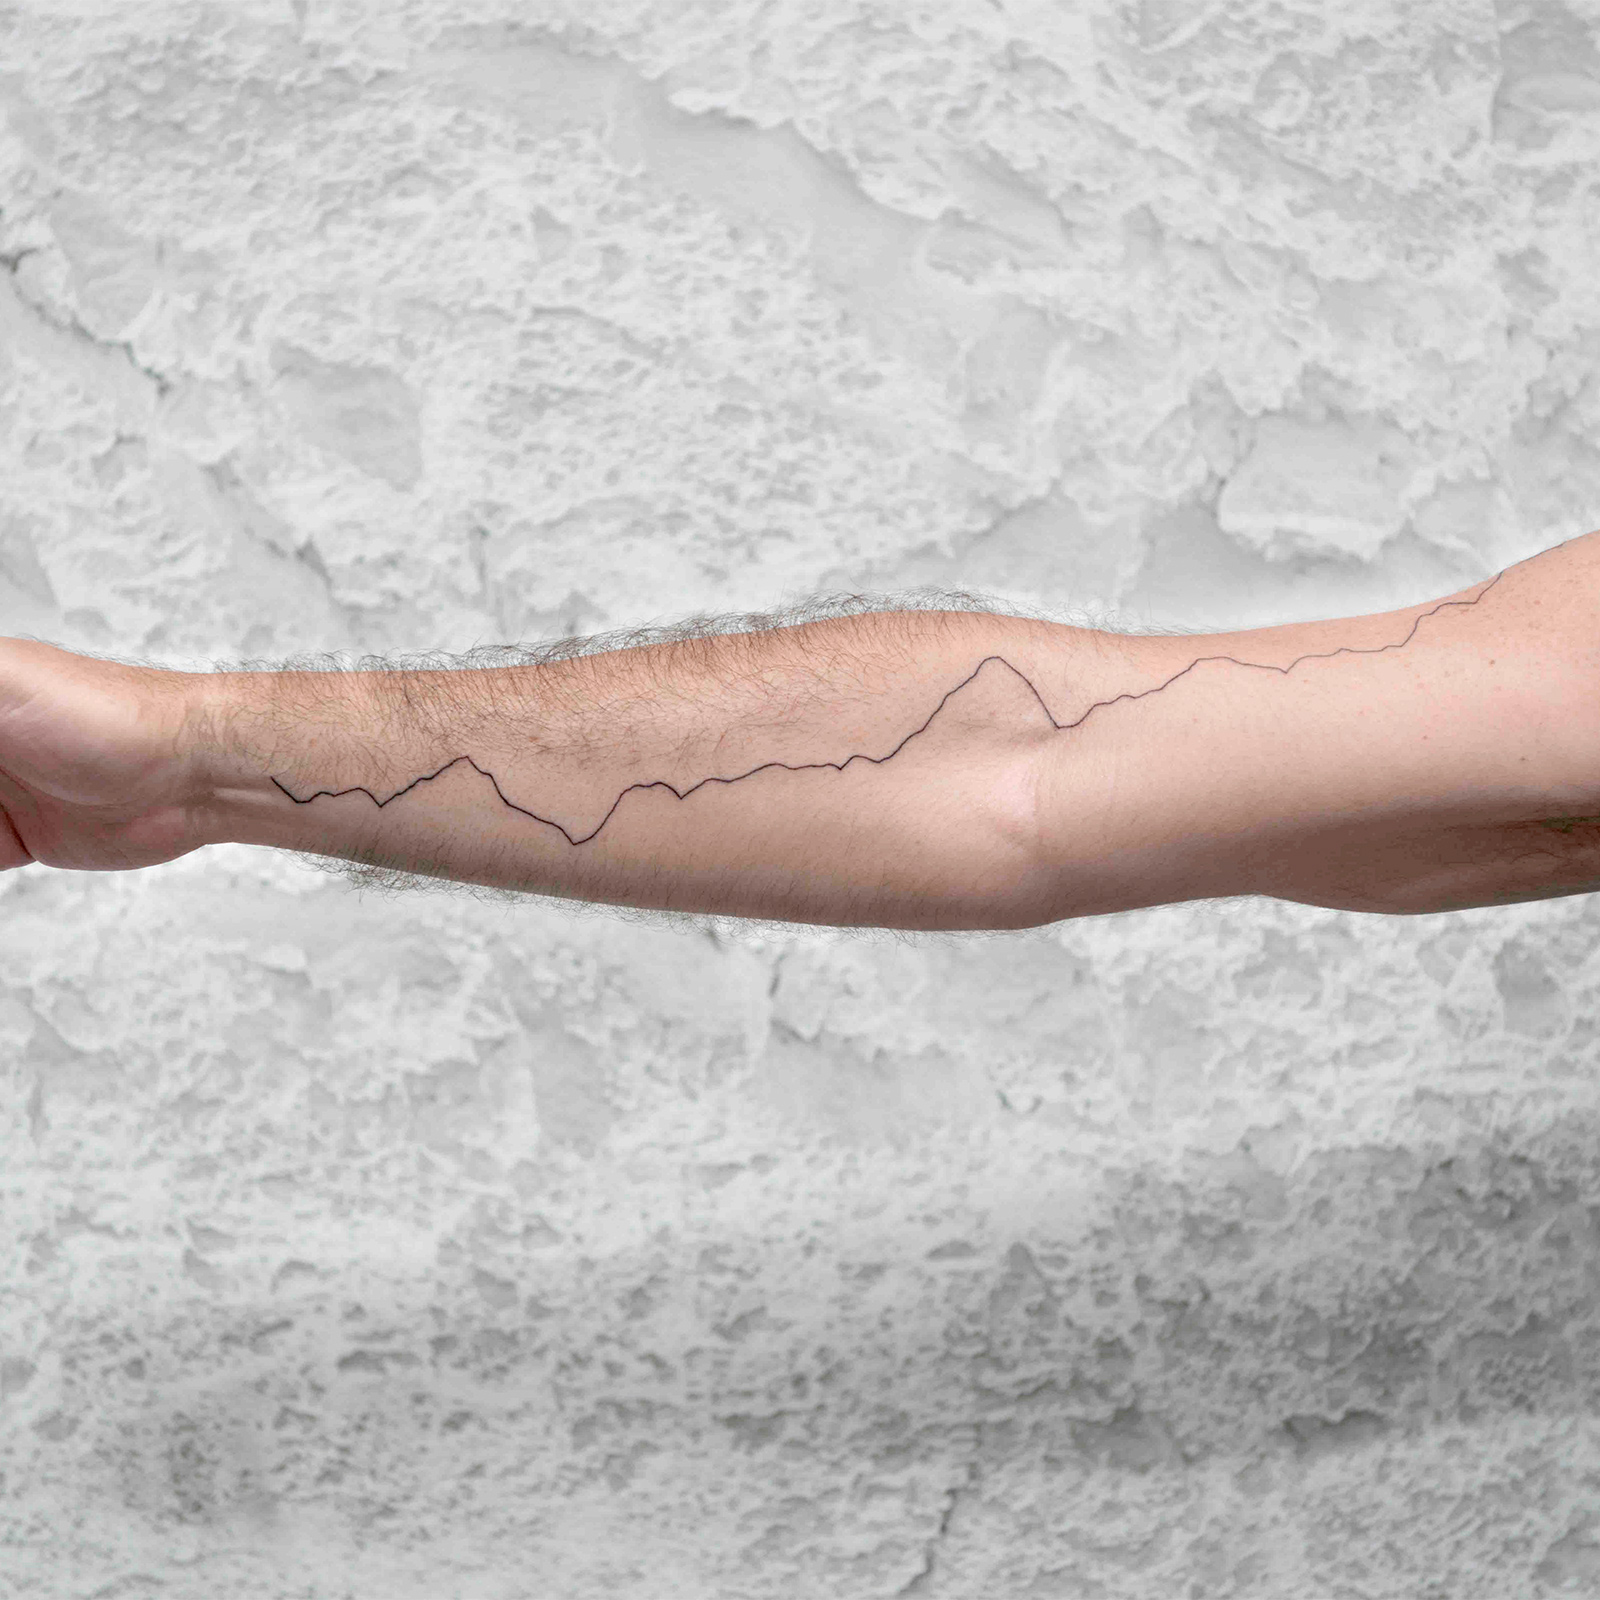 Justin Brice Guariglia's arm tatoo